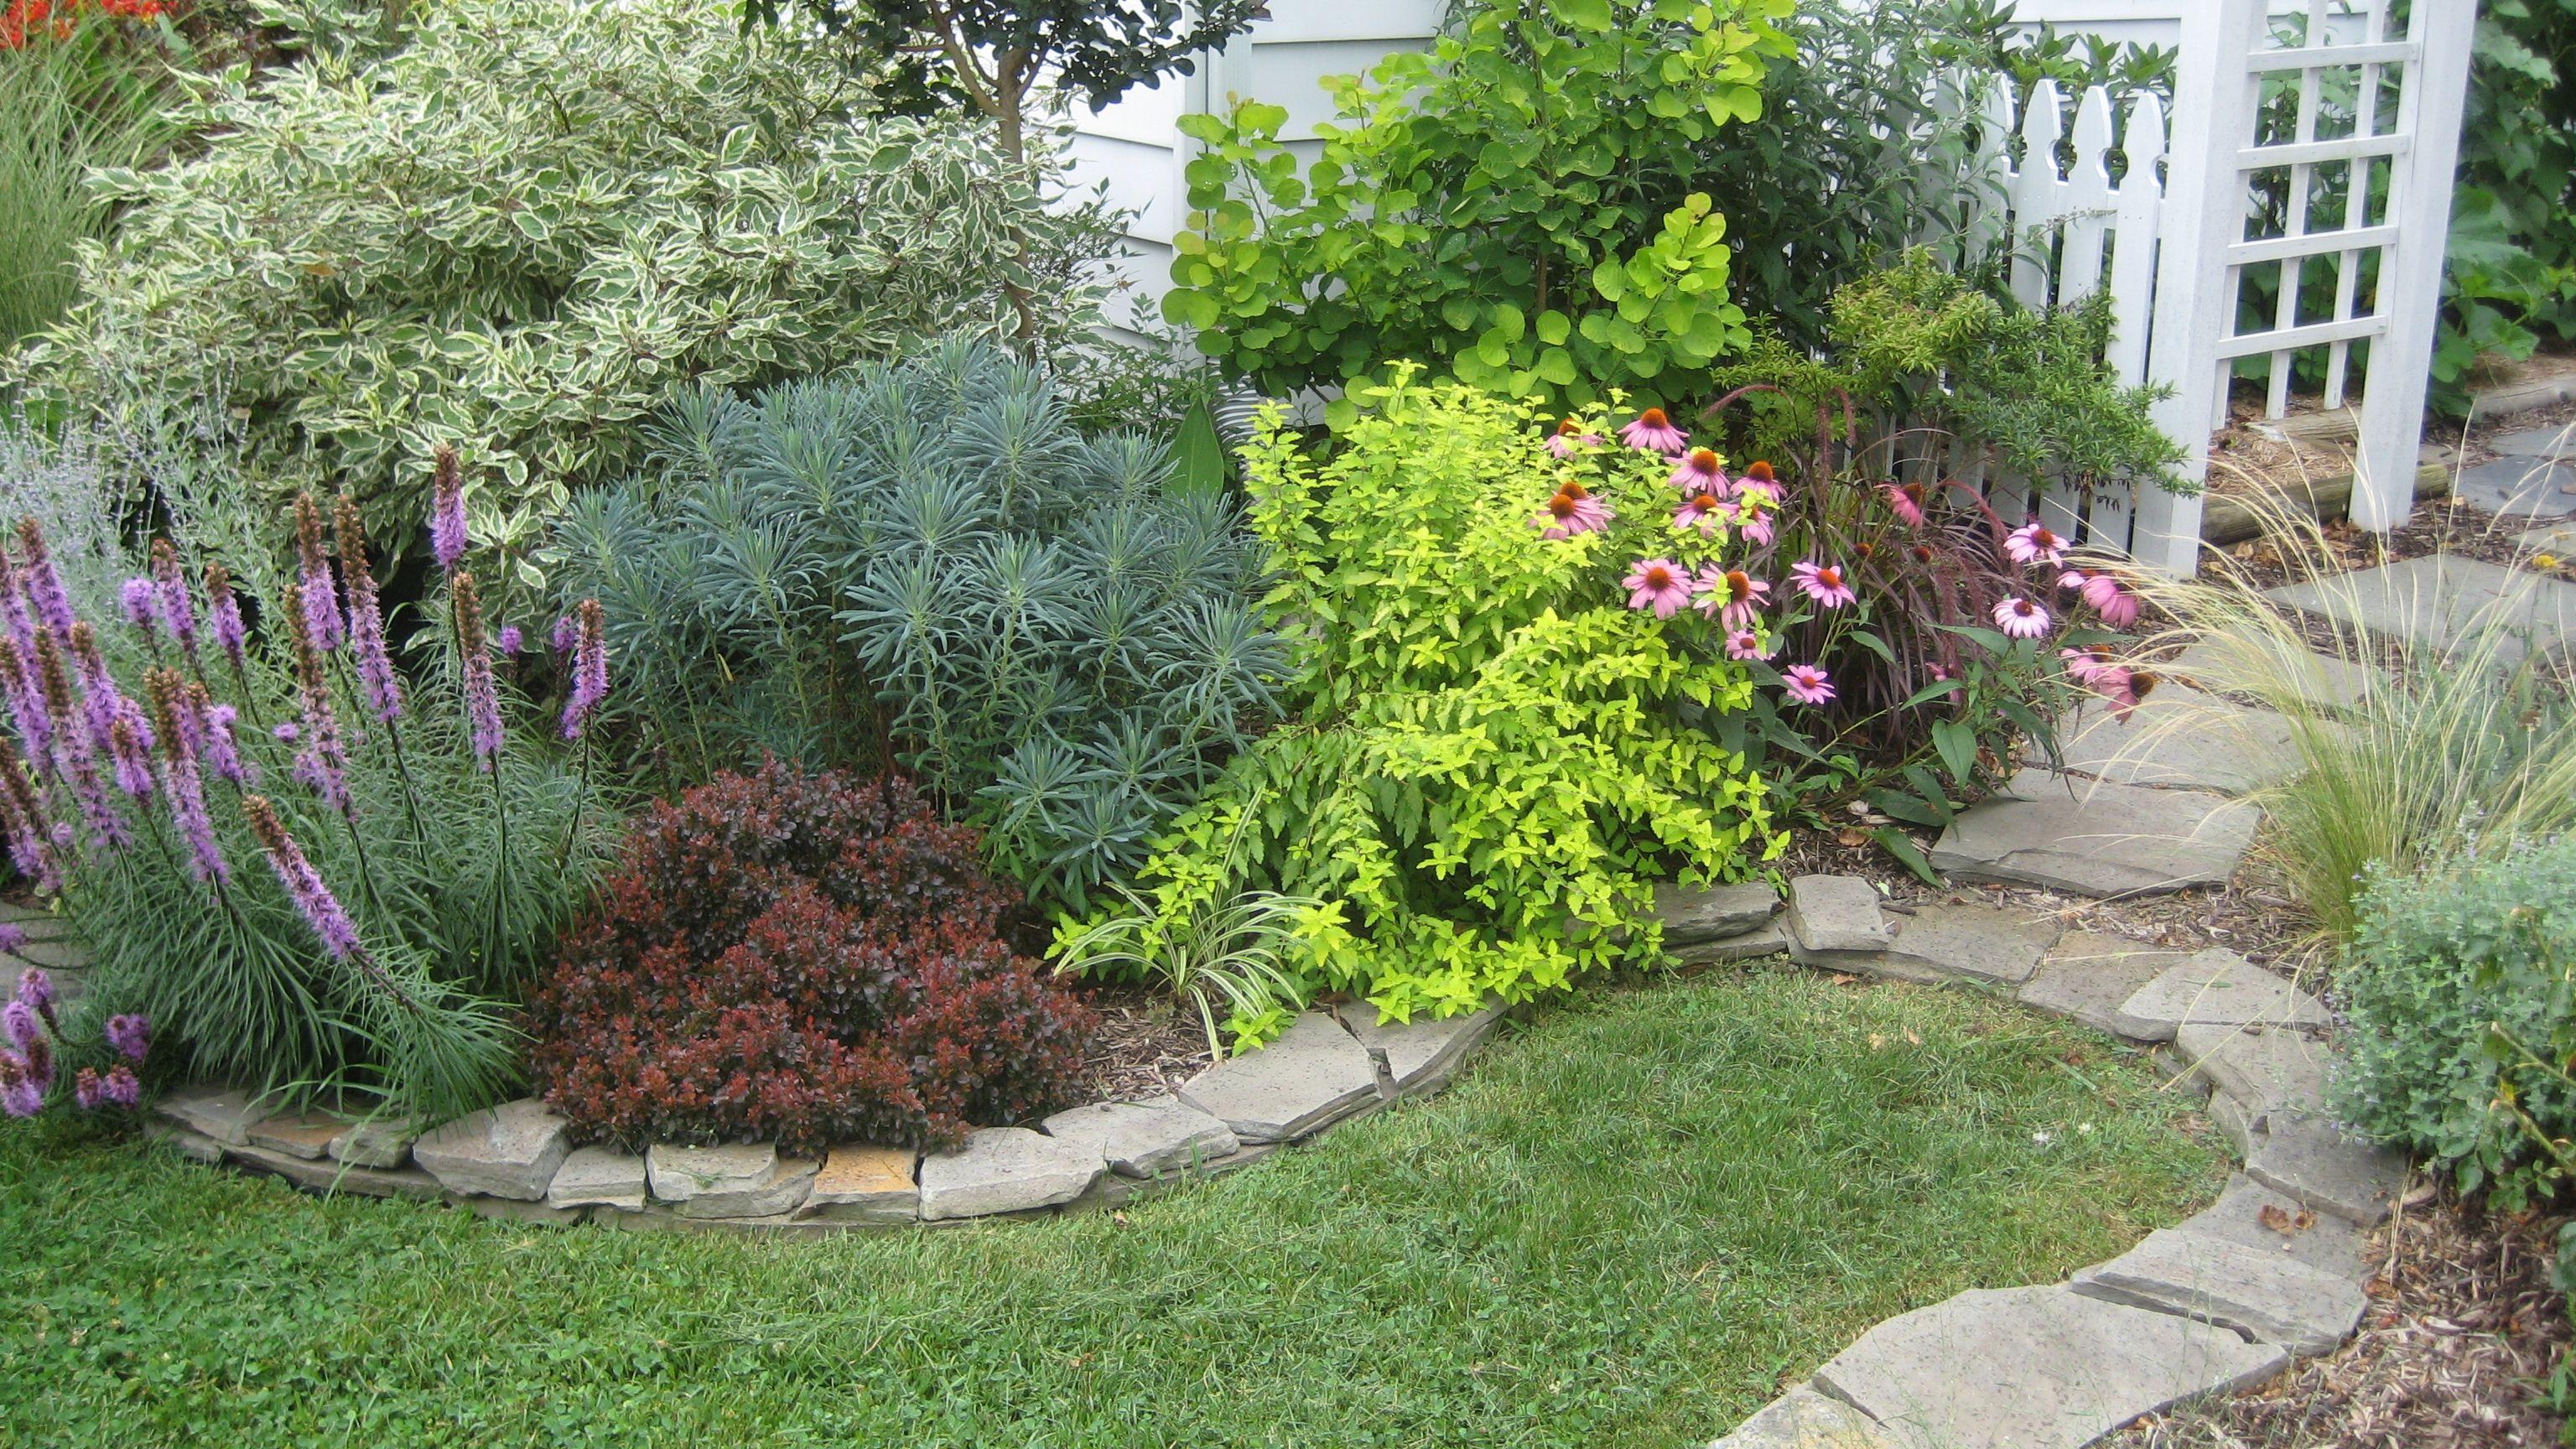 Dry stack stone wall edging garden design edging for Rock flower garden ideas